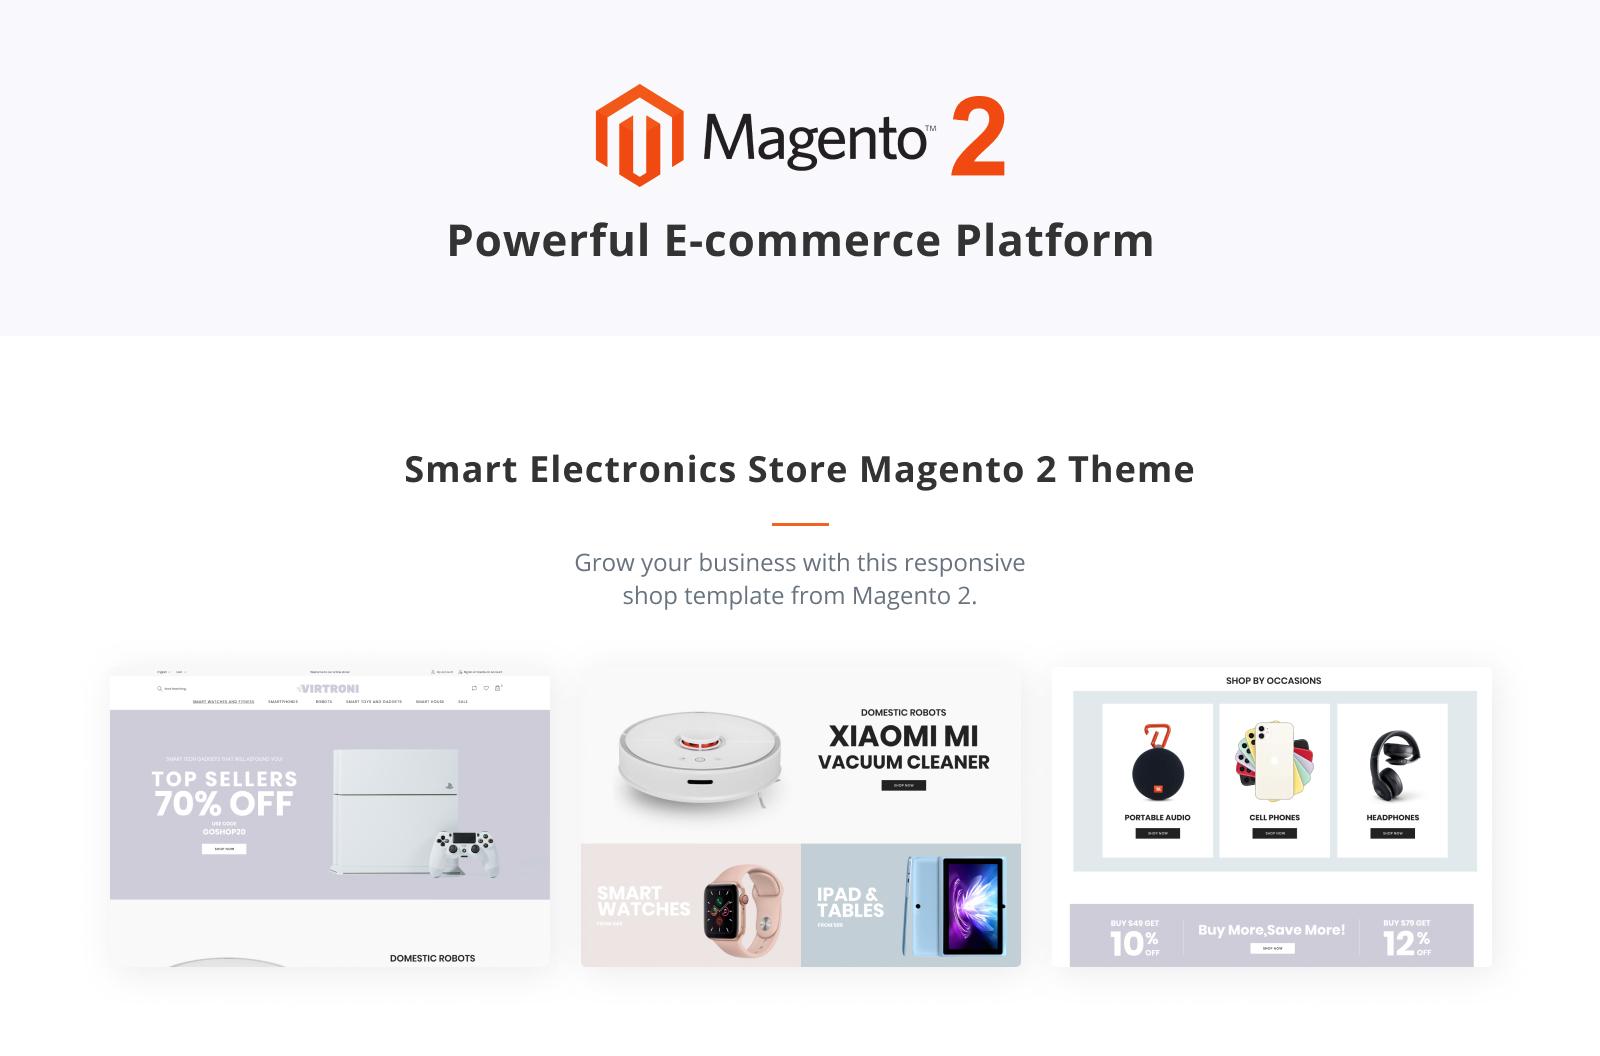 Virtroni - Smart Electronics Store Magento 2 Theme - 1